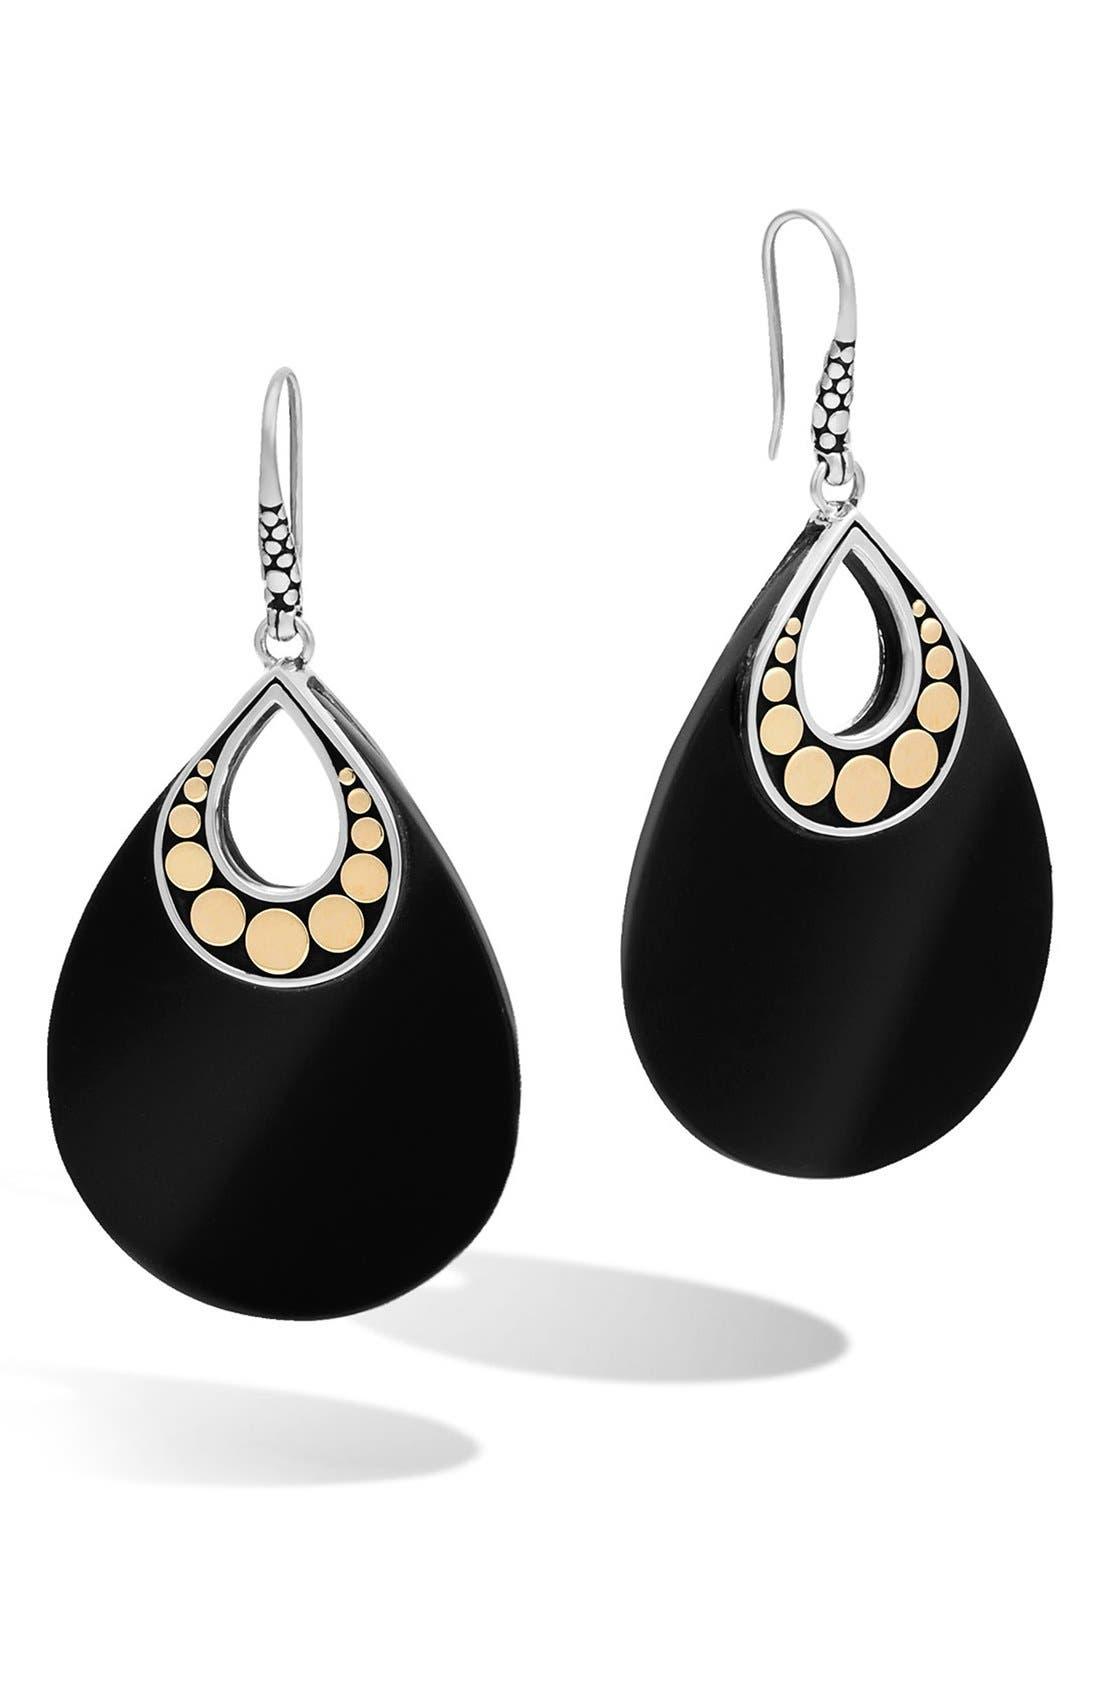 'Dot' Drop Earrings,                             Main thumbnail 1, color,                             Silver/ Black Chalcedony